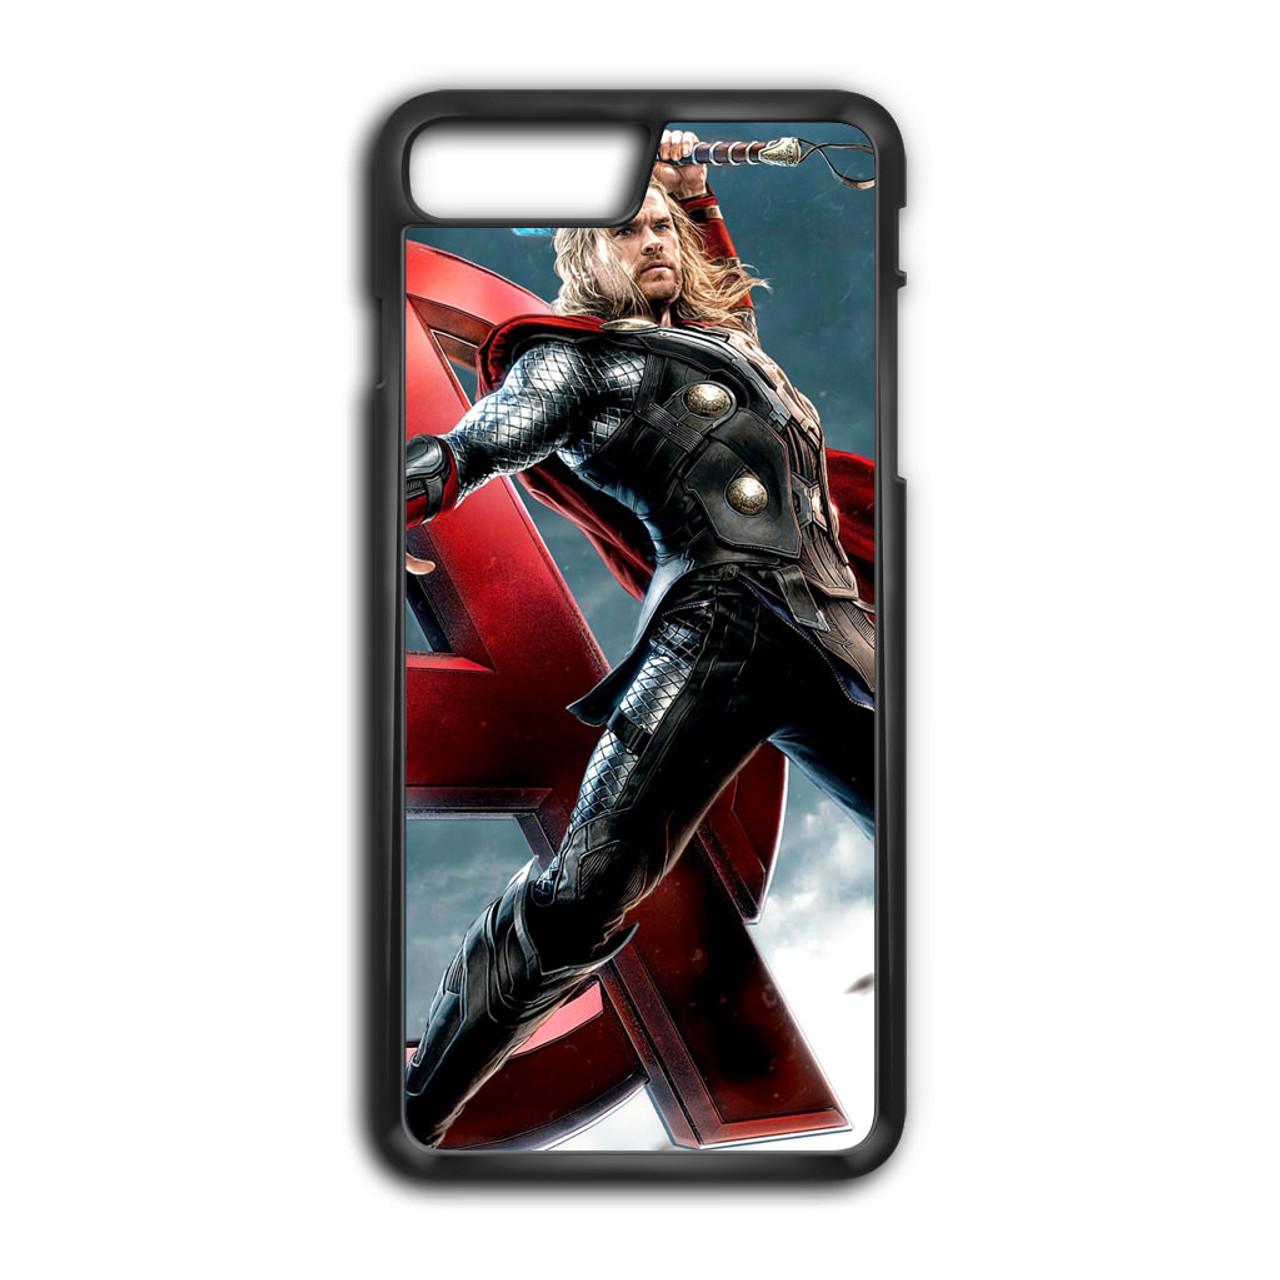 brand new 0c345 46113 Thor Avengers iPhone 7 Plus Case